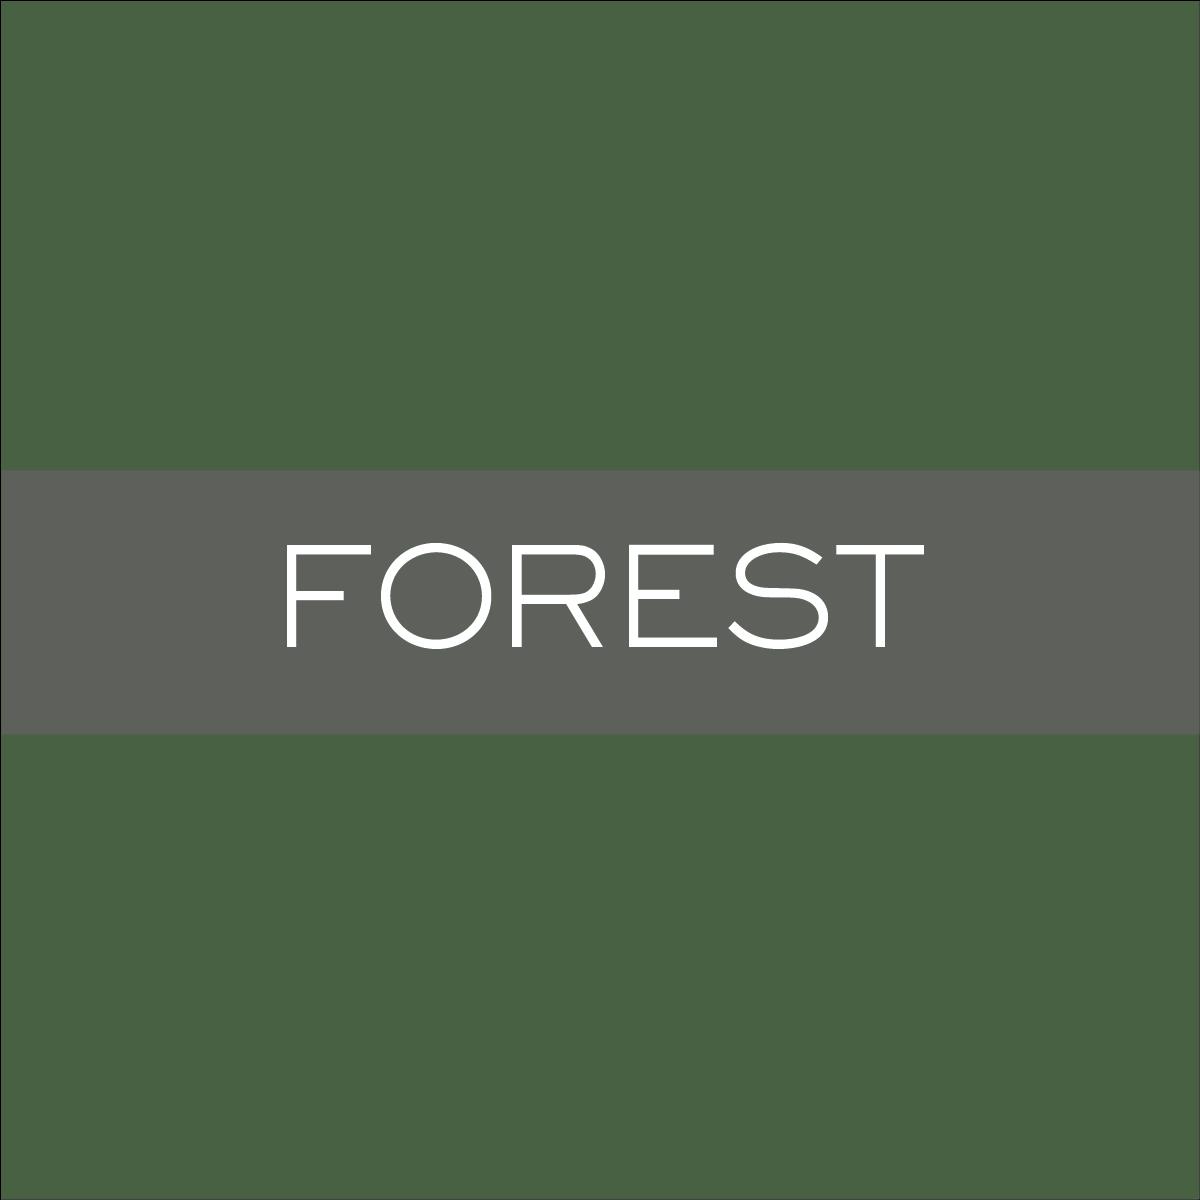 INK_Forest.jpg